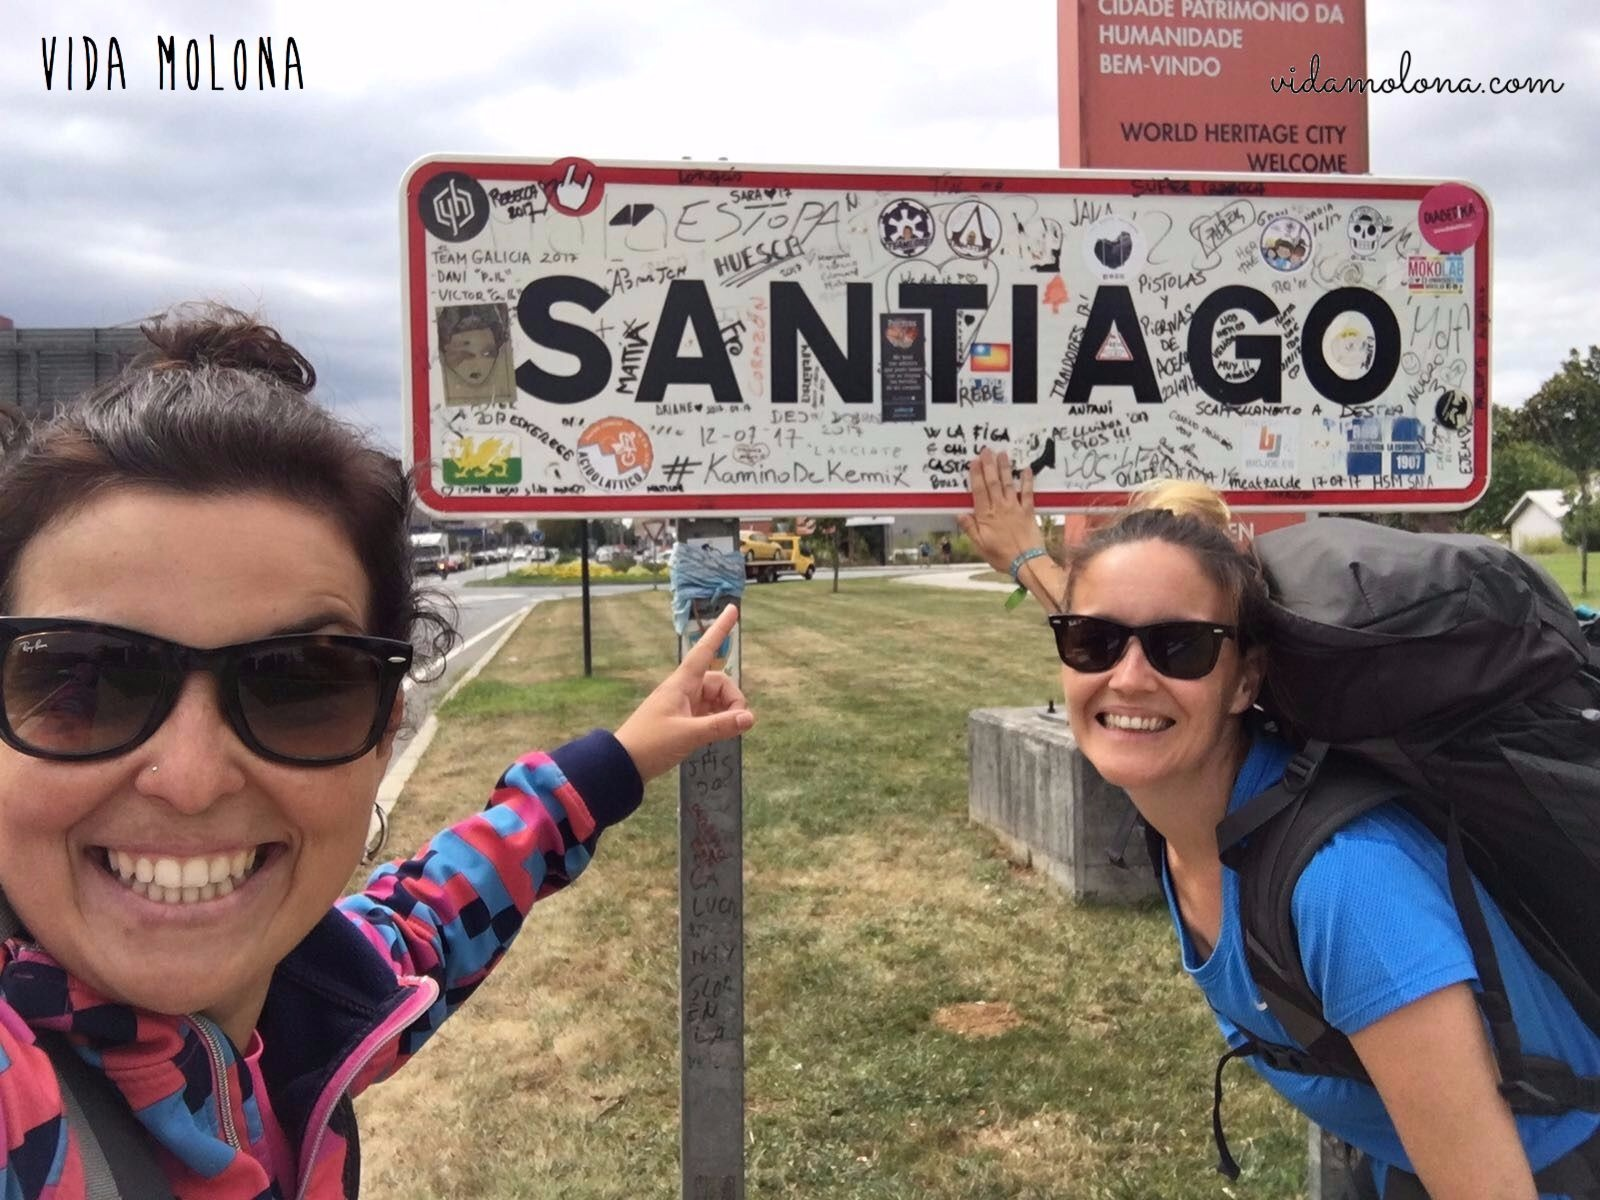 camino-de-santiago-en-7-dias-camino-frances-19